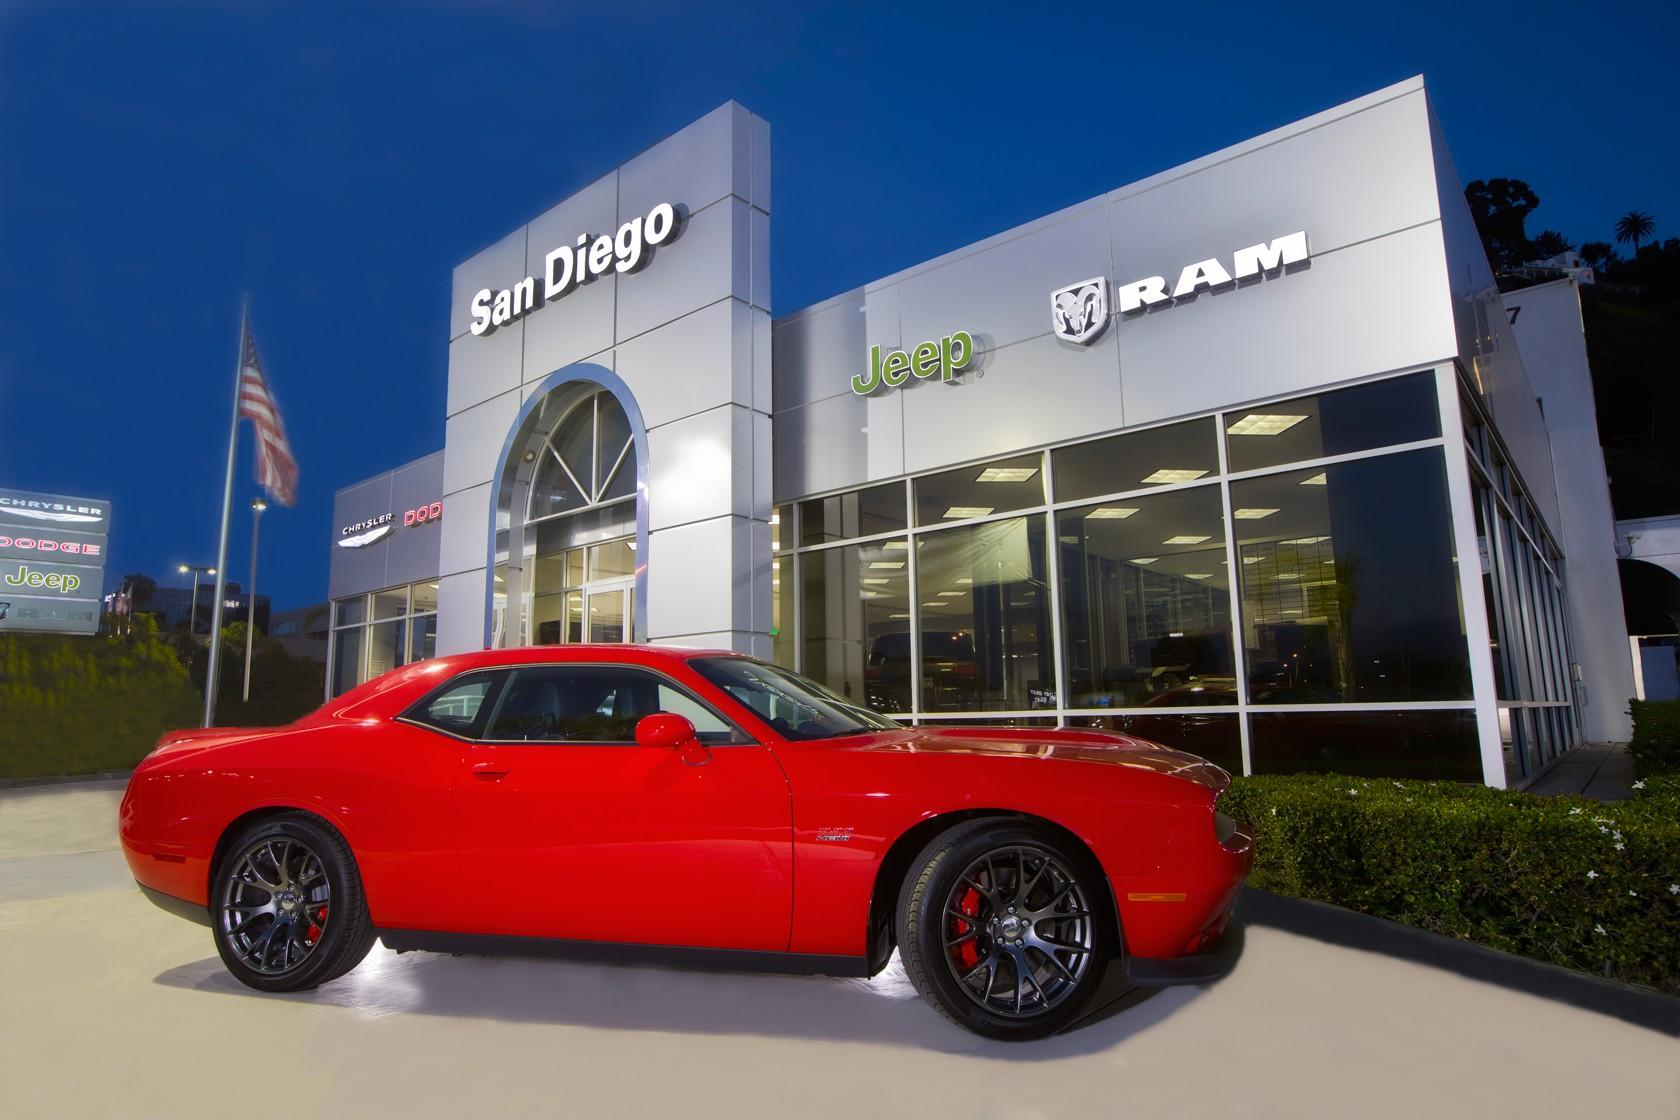 Dodge San Diego >> San Diego Chrysler Dodge Jeep Ram Linkedin